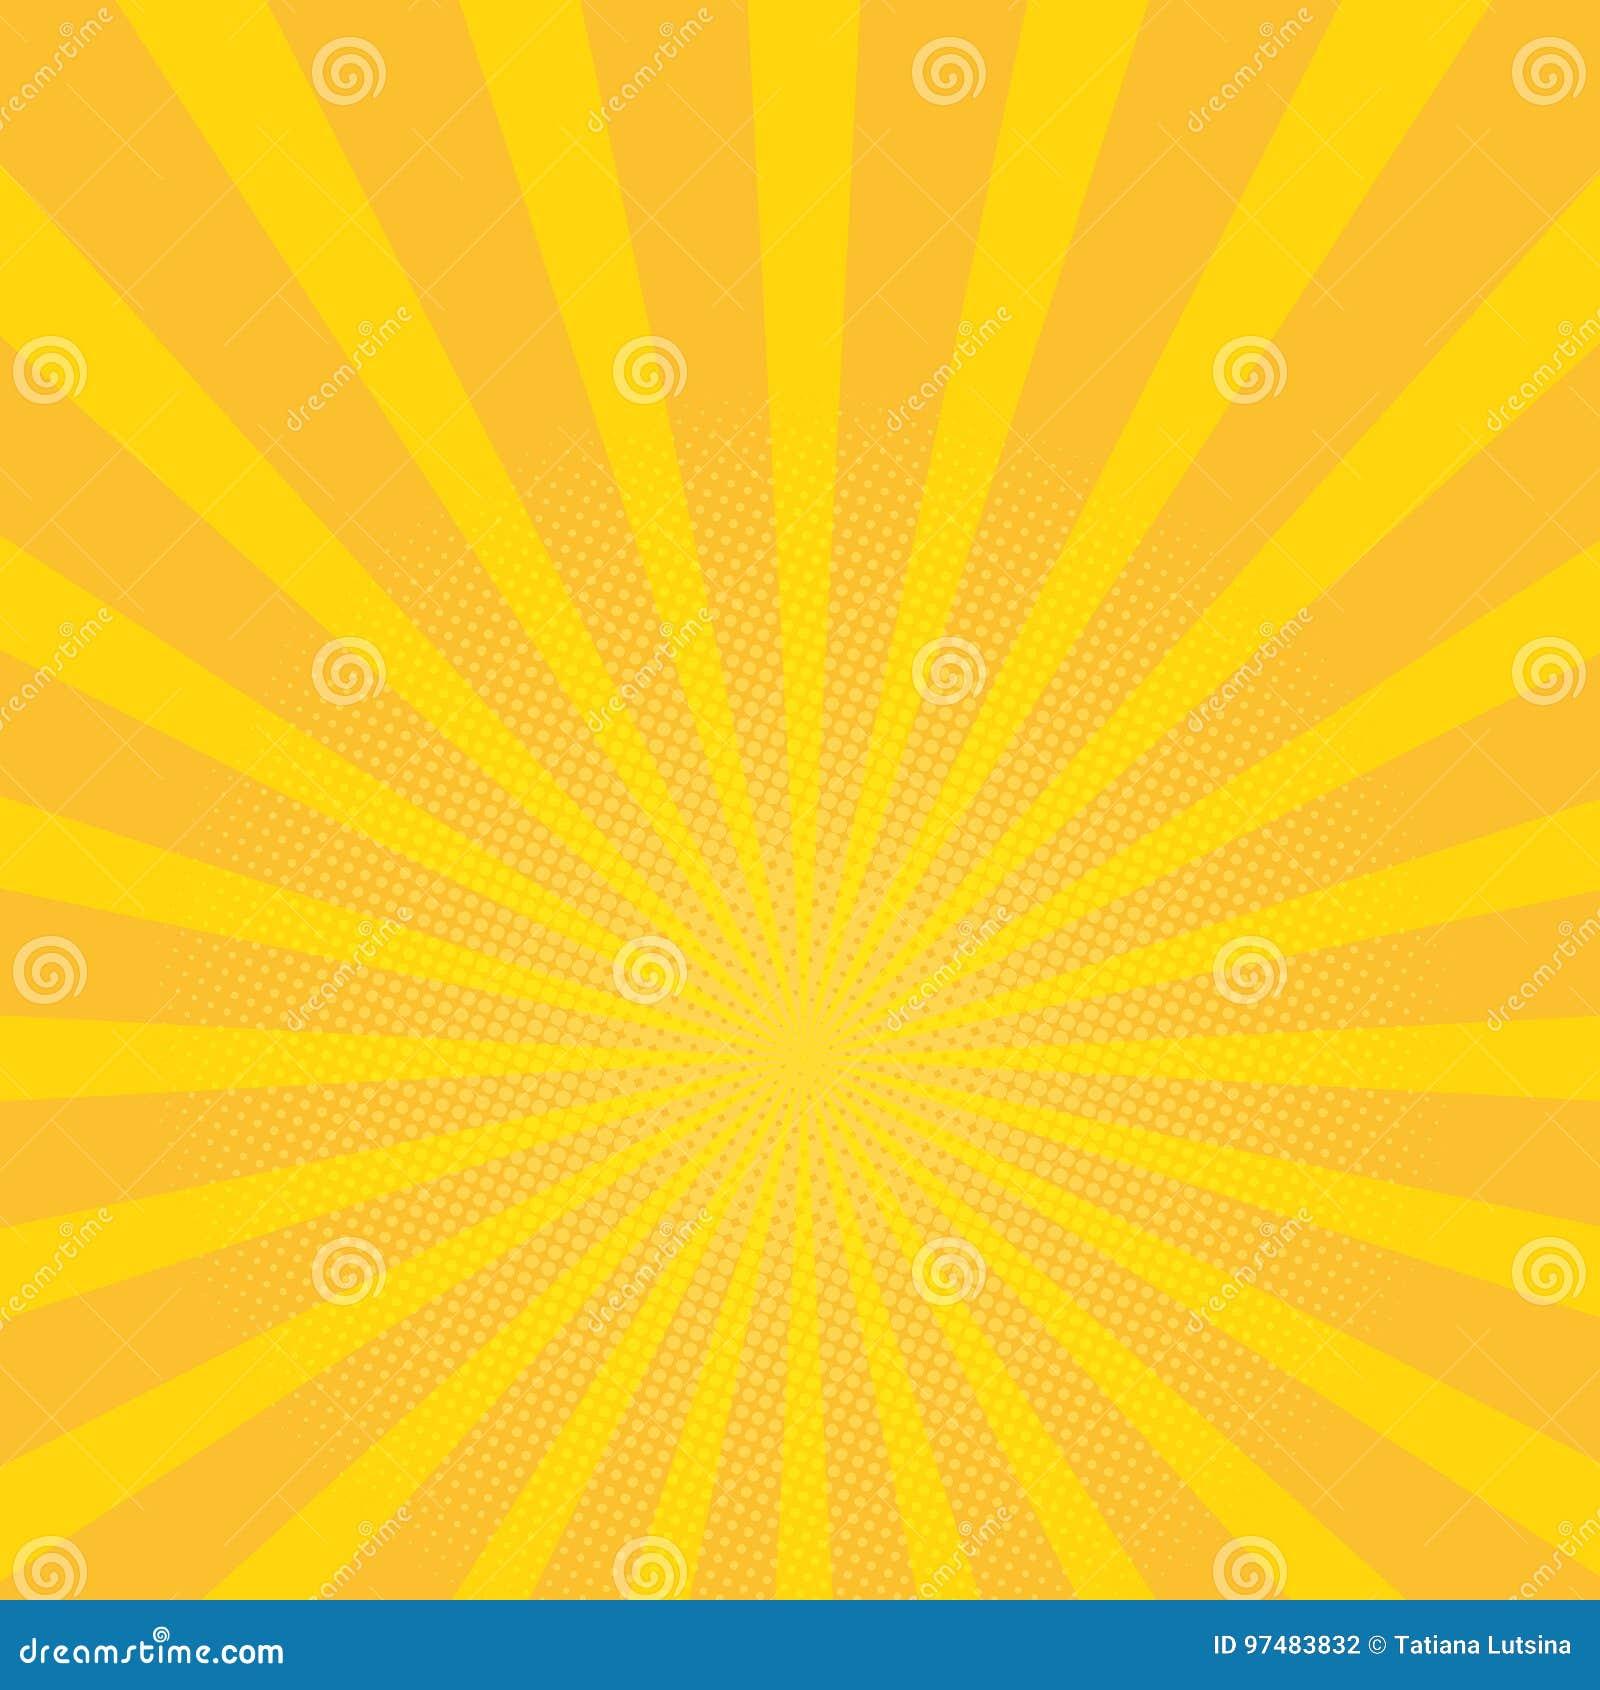 3ab903240a38e Beautiful summer sunburst background. yellow rays pop art background. retro  vector illustration.